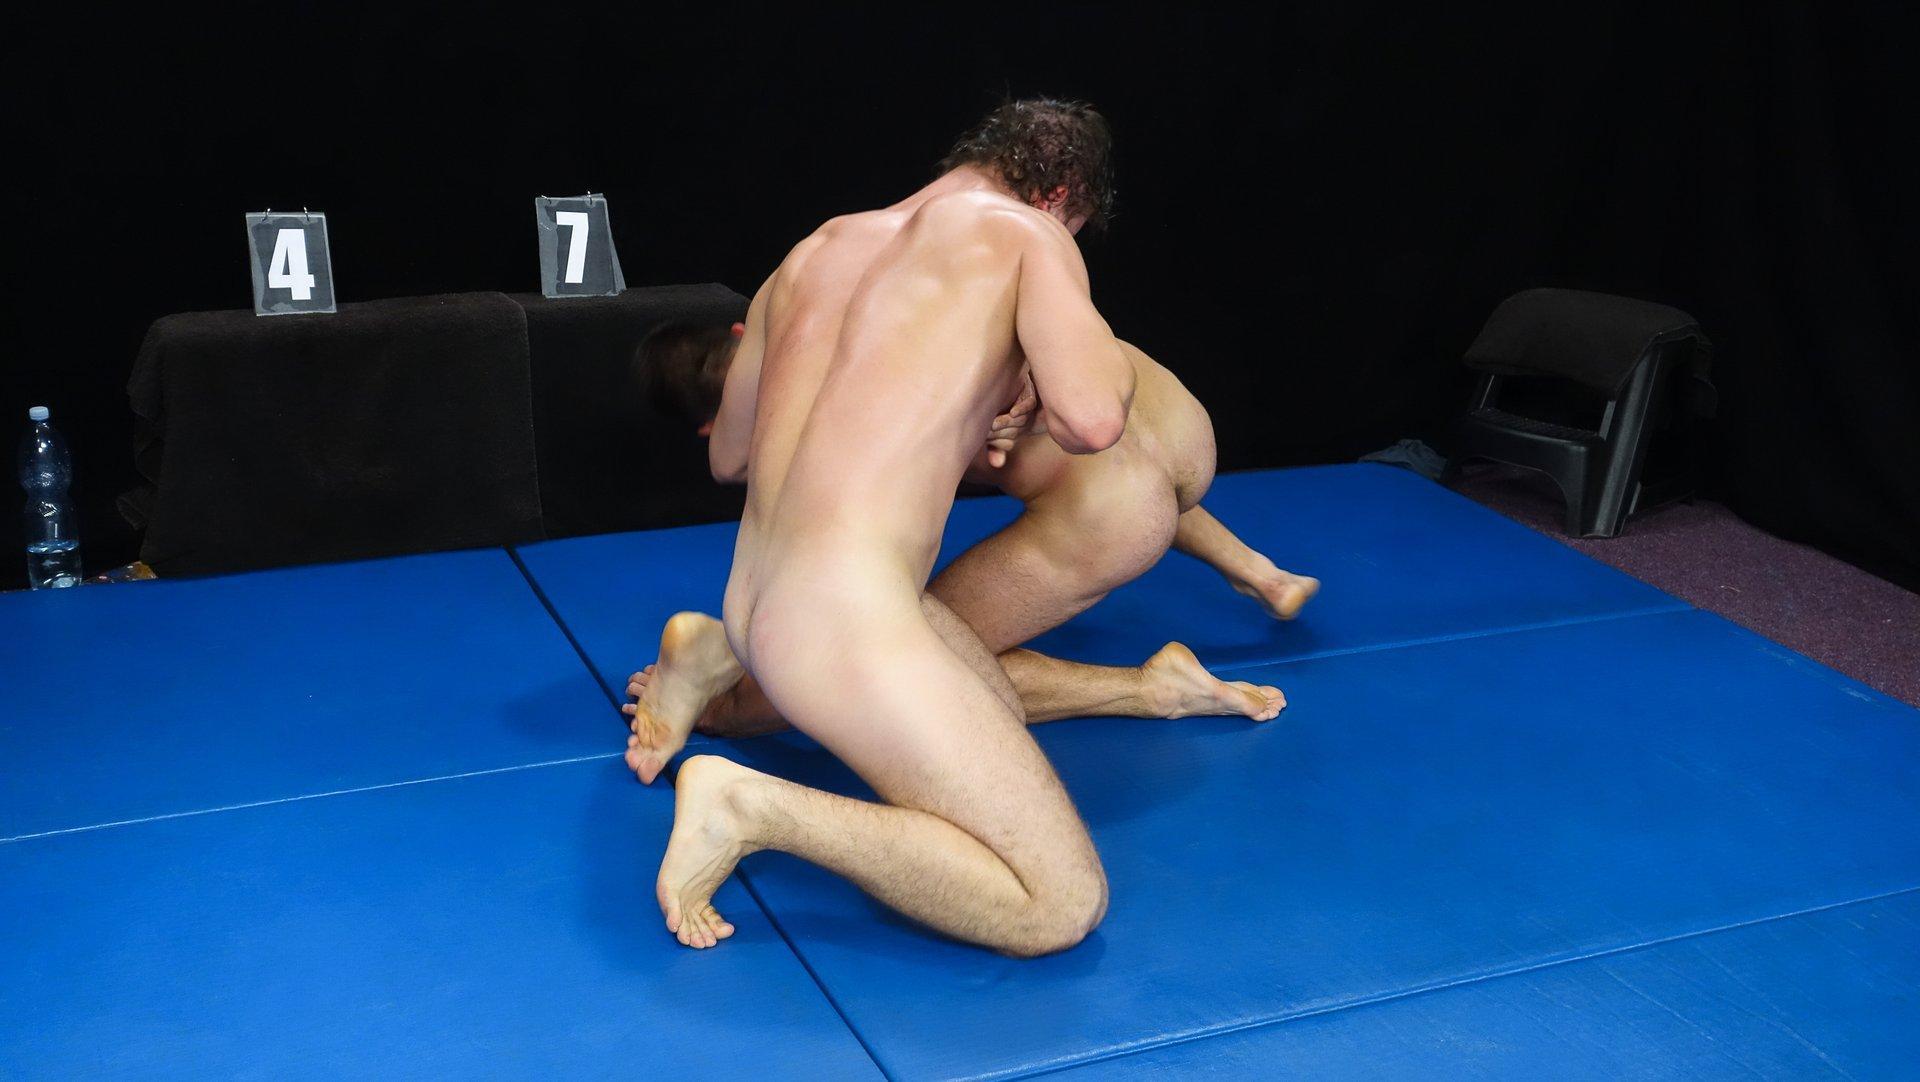 Photo number 6 from Alan vs Viktor - WRESTLING shot for swnude on Kink.com. Featuring Alan Carly and Viktor Burek in hardcore BDSM & Fetish porn.